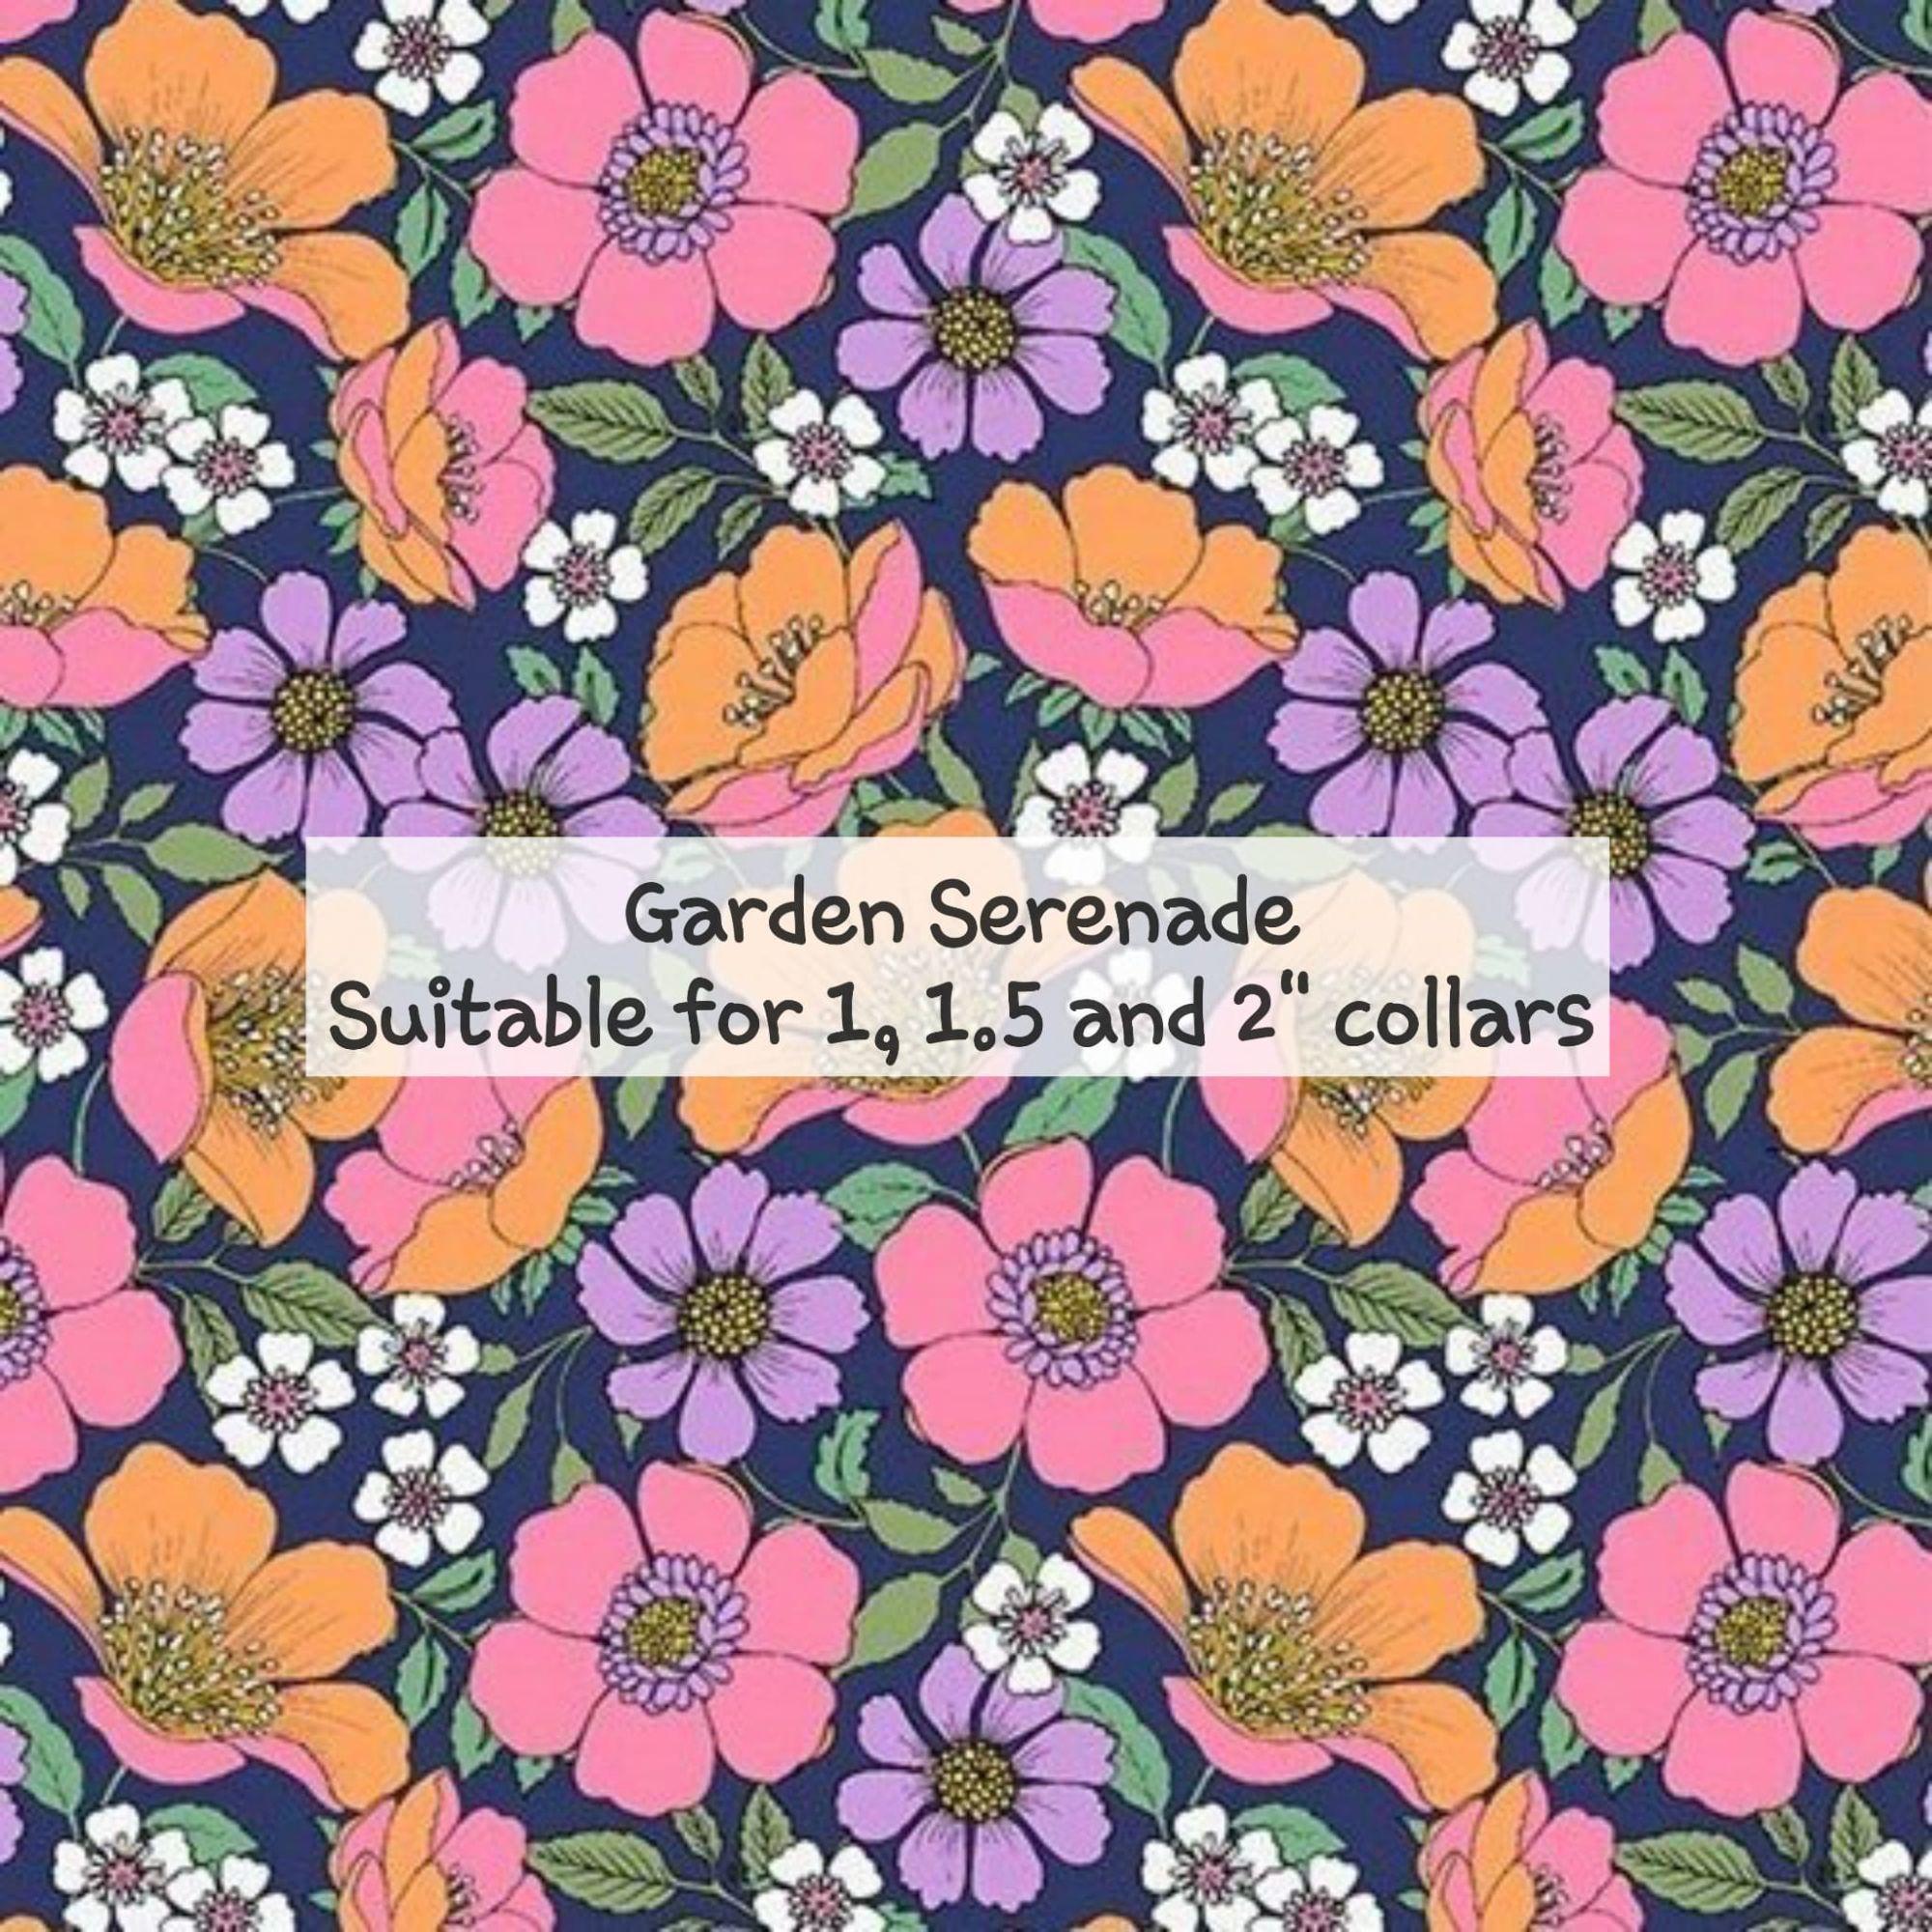 Garden Serenade